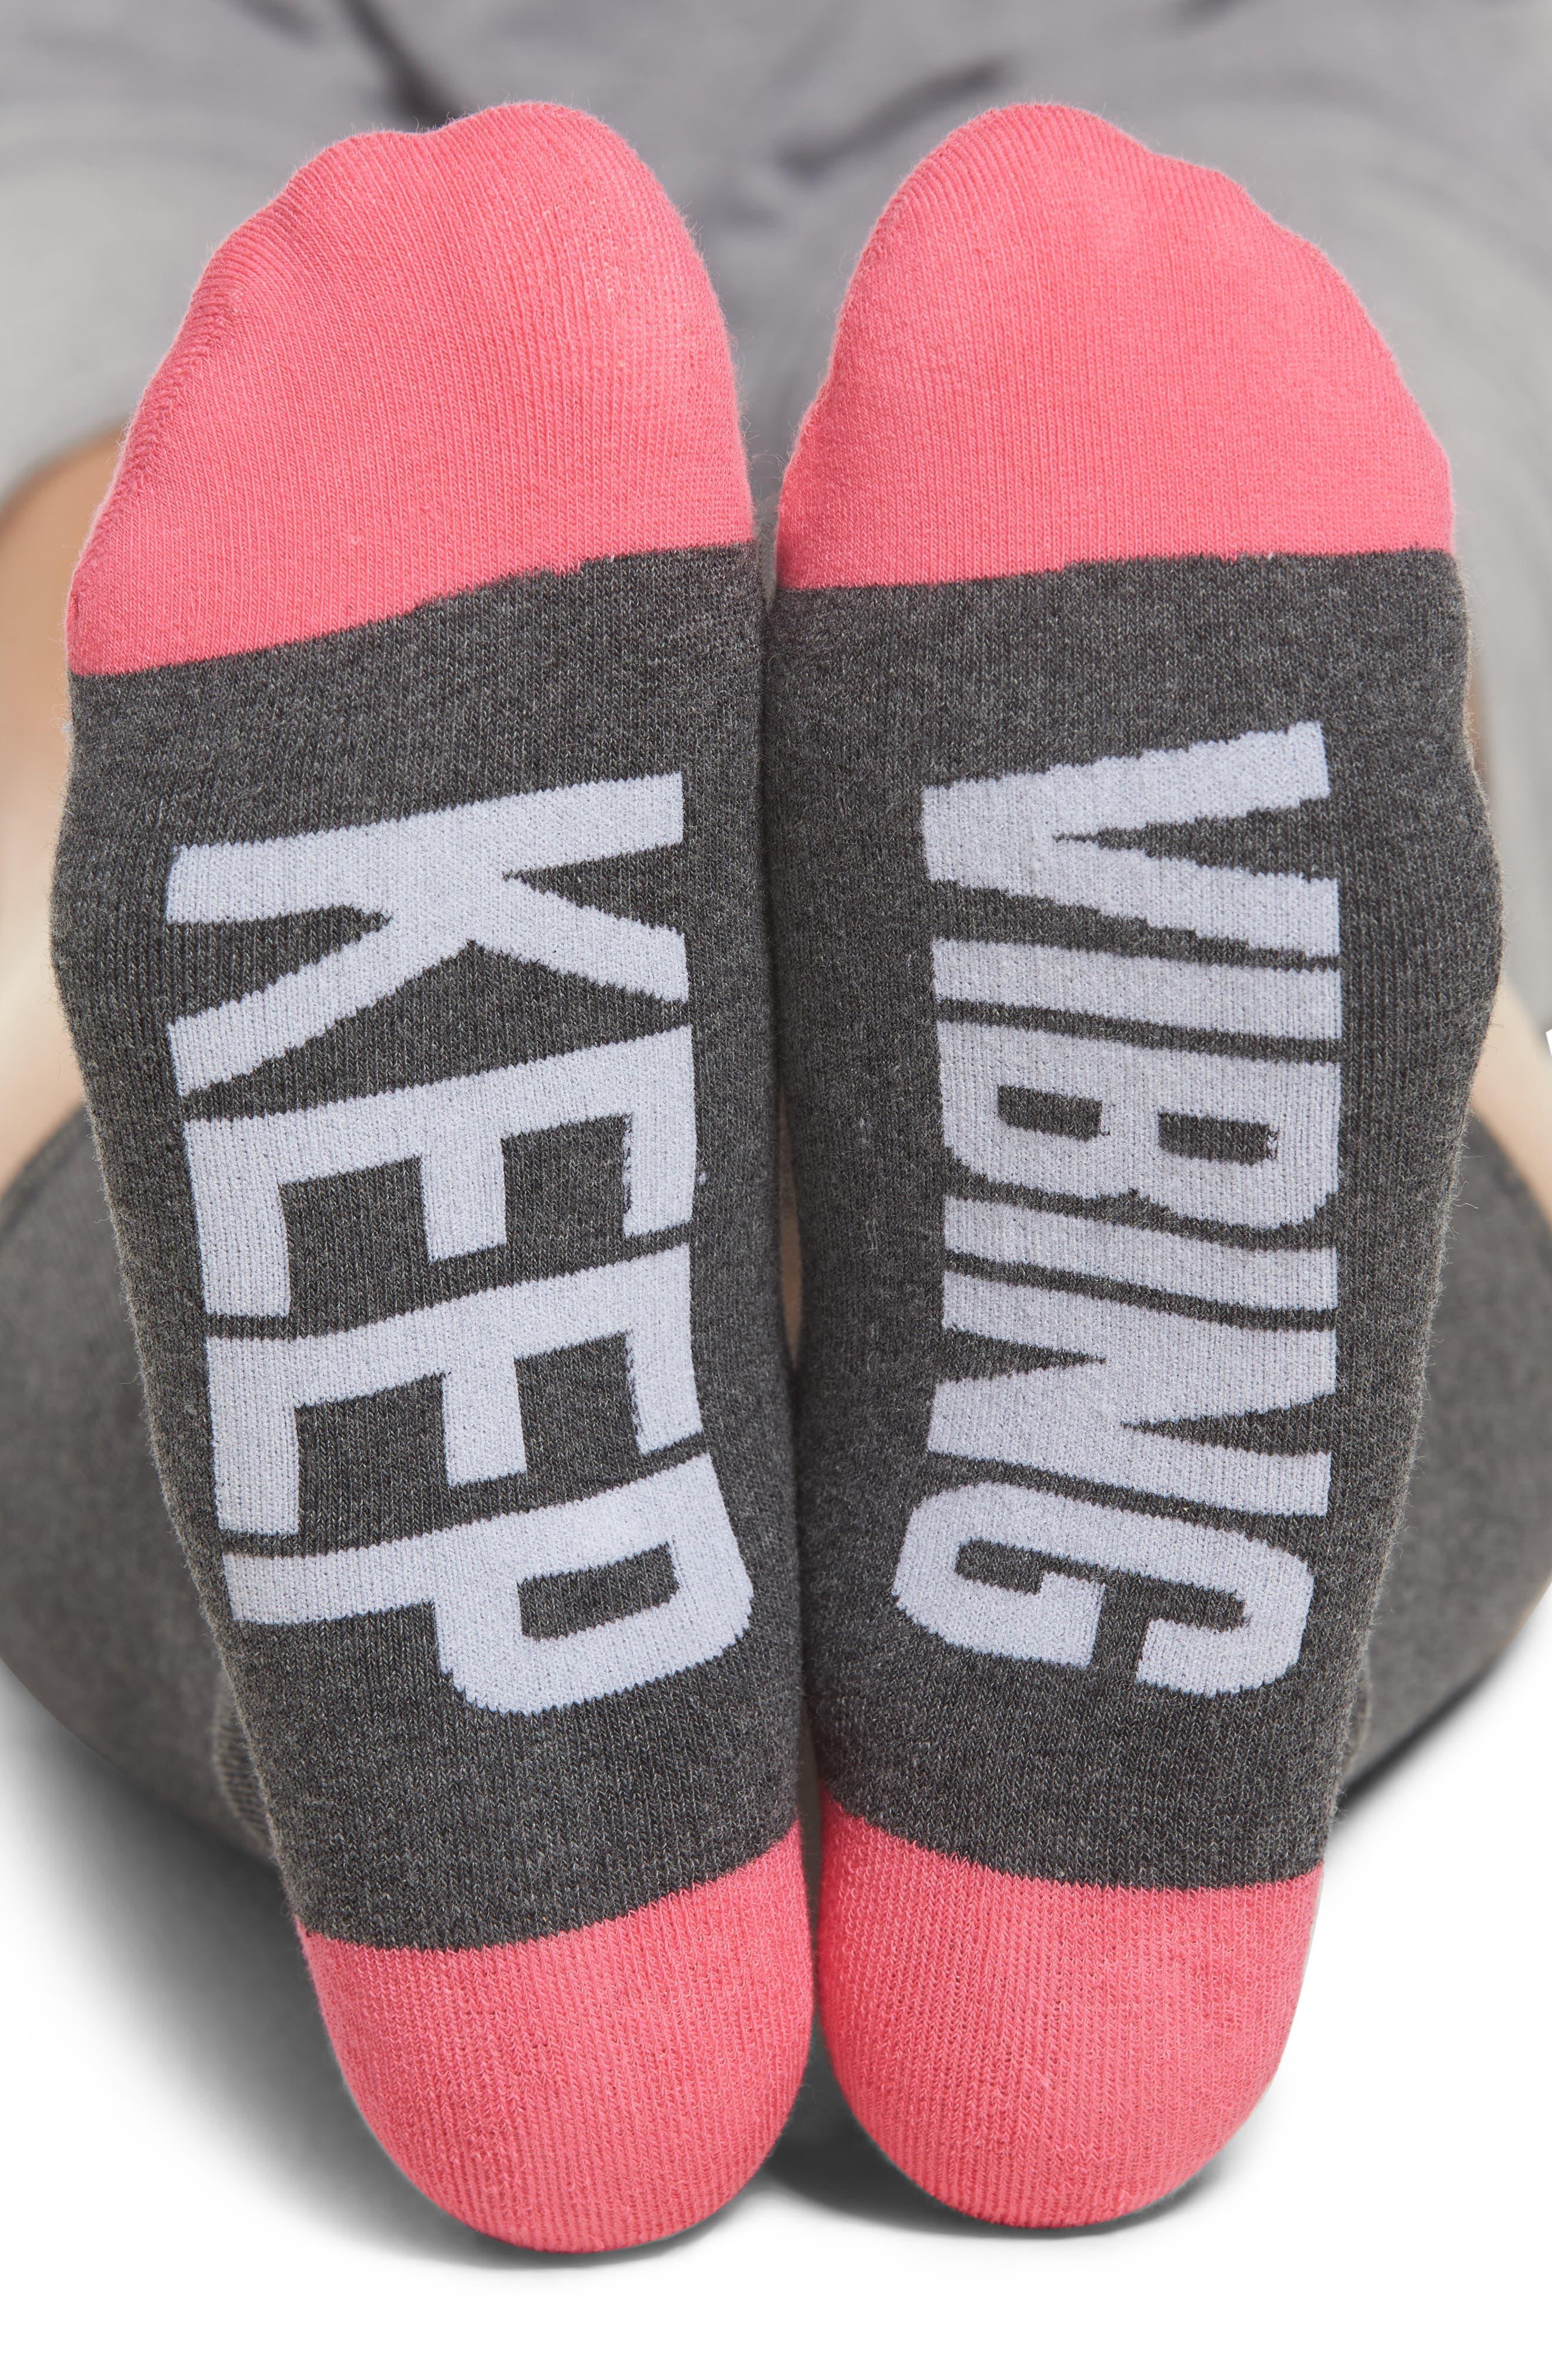 Keep Vibing Crew Socks,                             Main thumbnail 1, color,                             Charcoal Heather